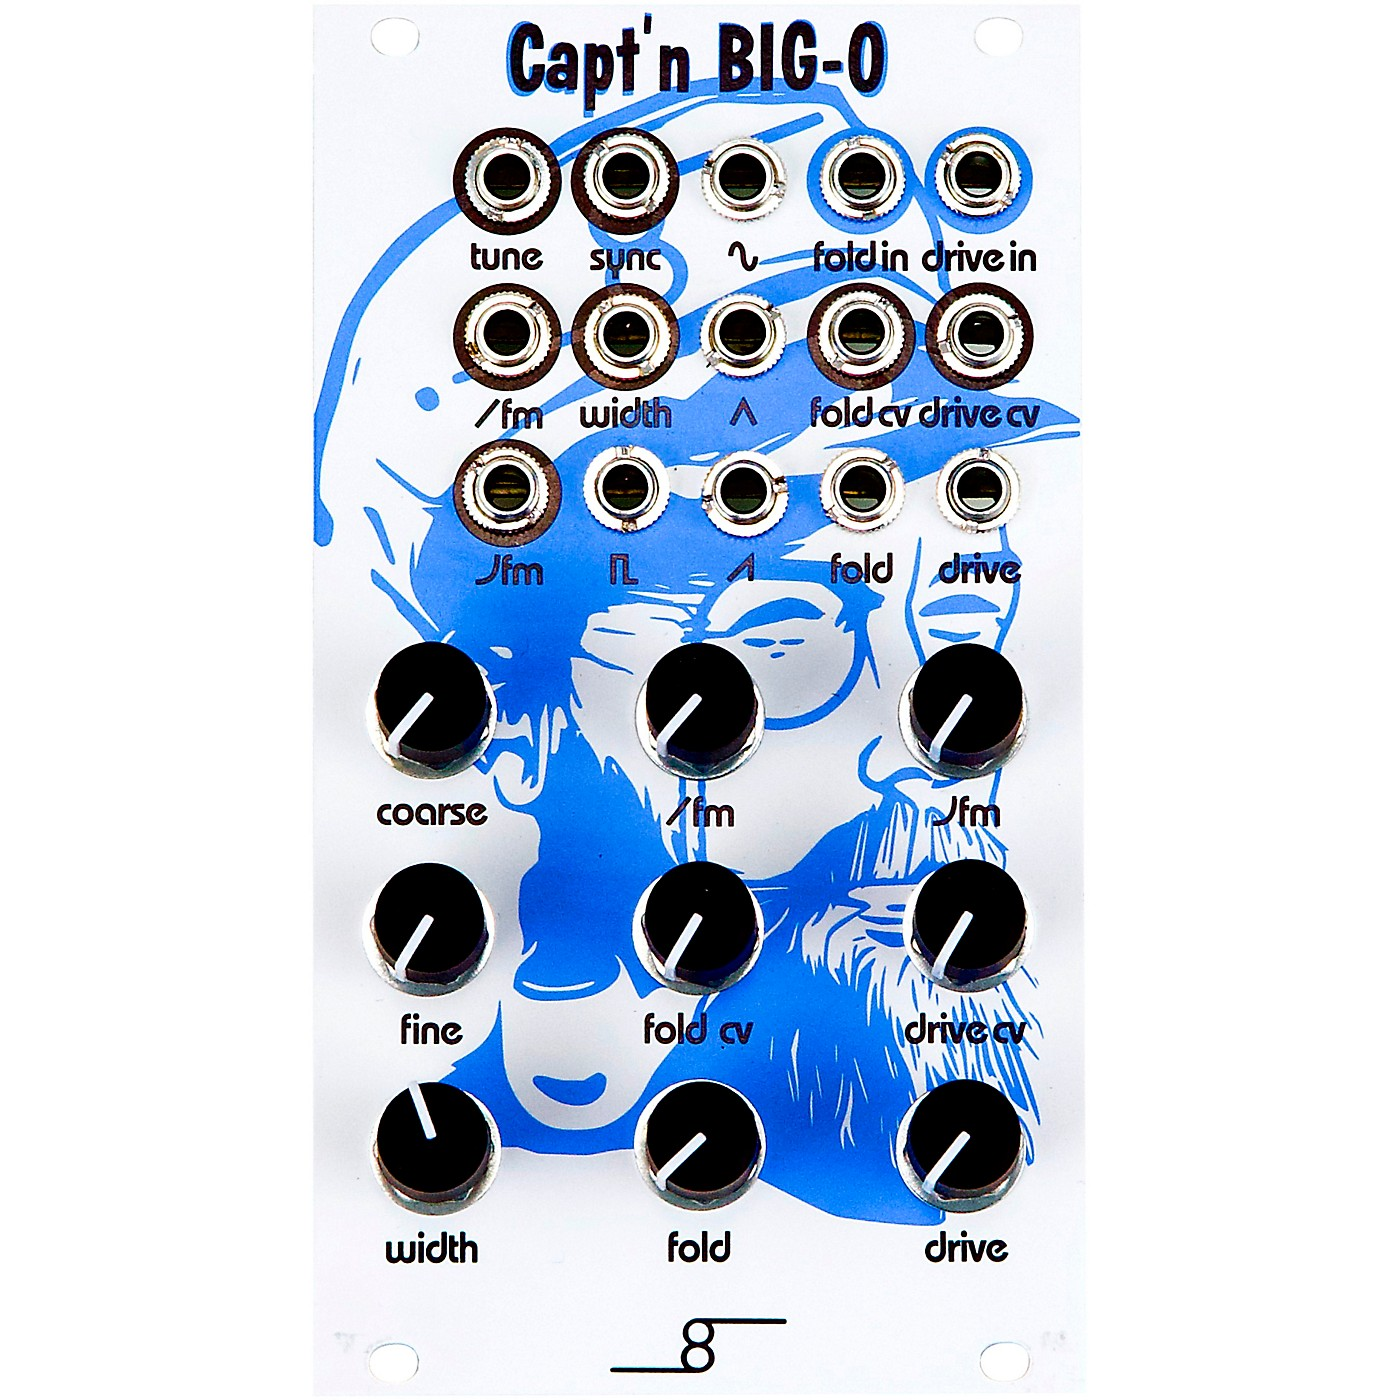 Cre8audio Capt'n Big-O thumbnail